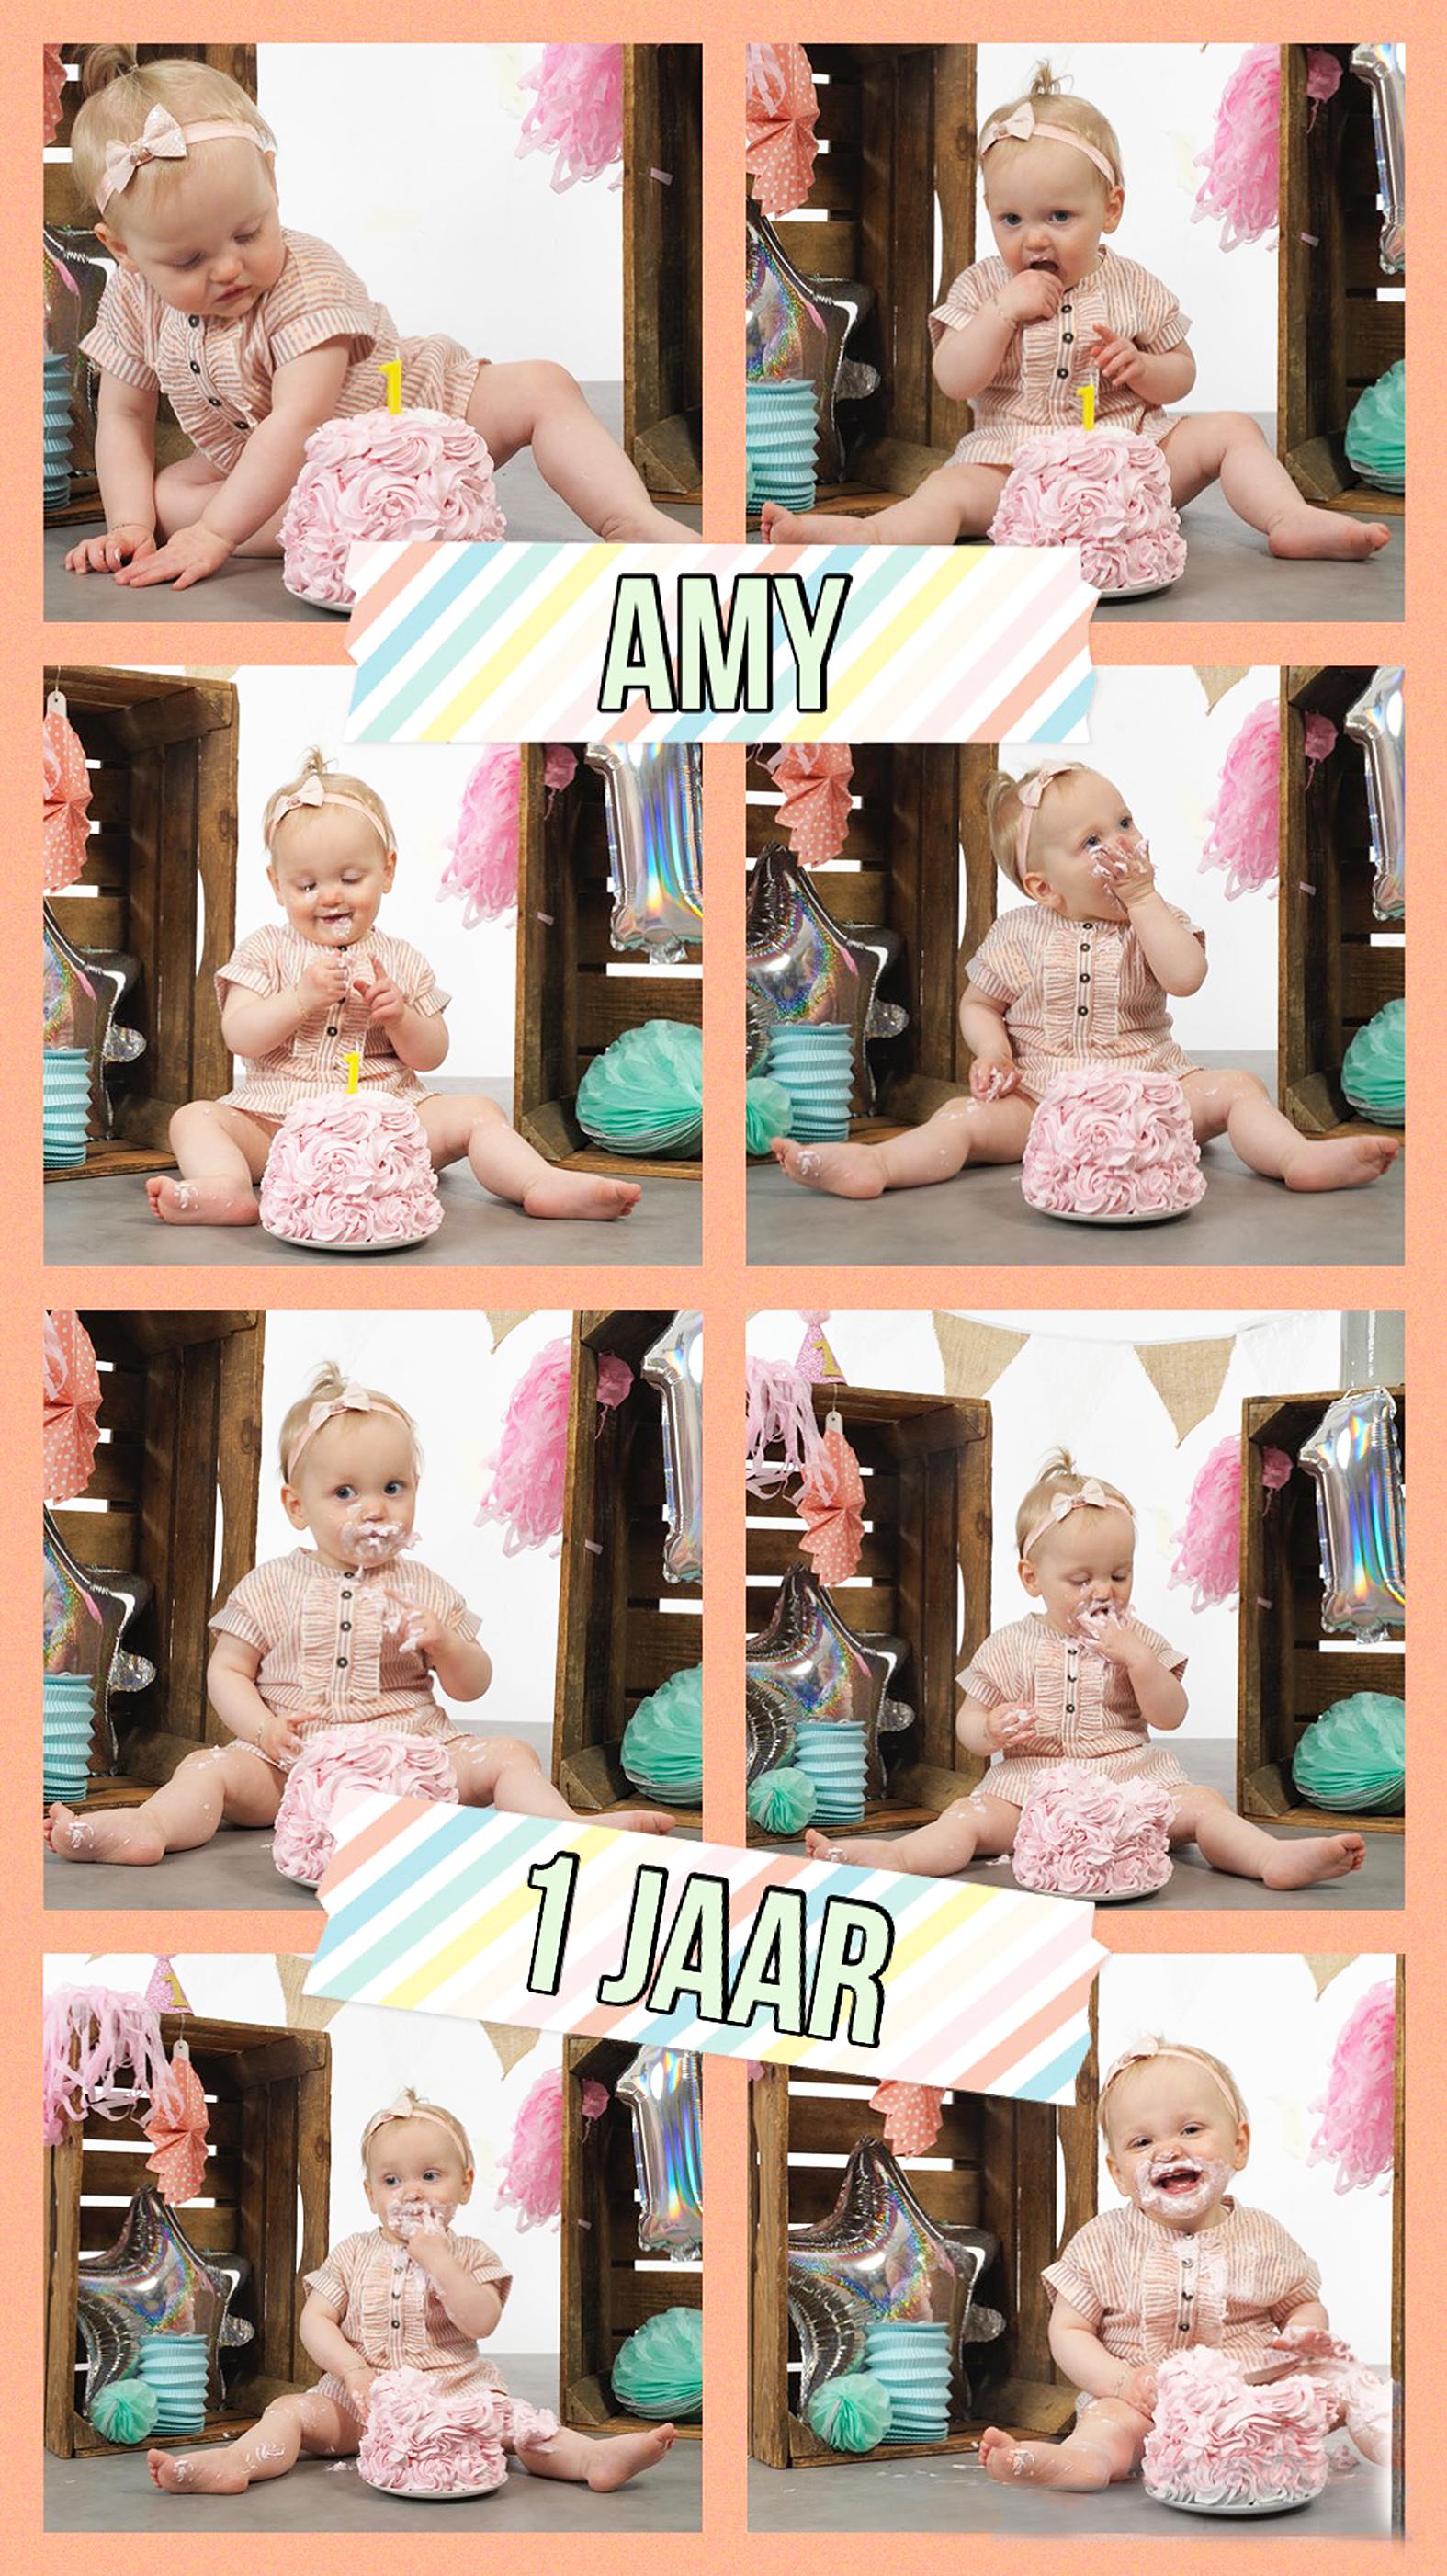 amy-1-jaar-bw